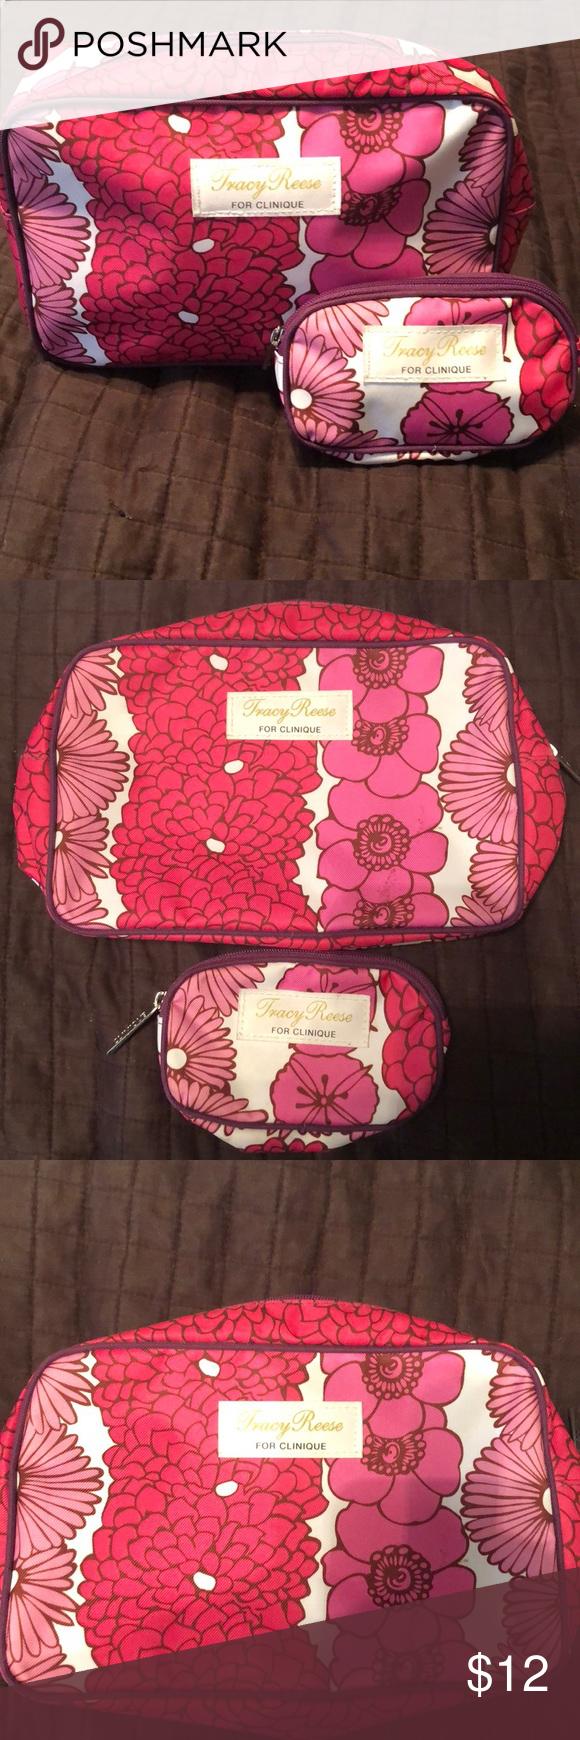 Tracy Reese for Clinique Makeup Bag Set Cute makeup bag